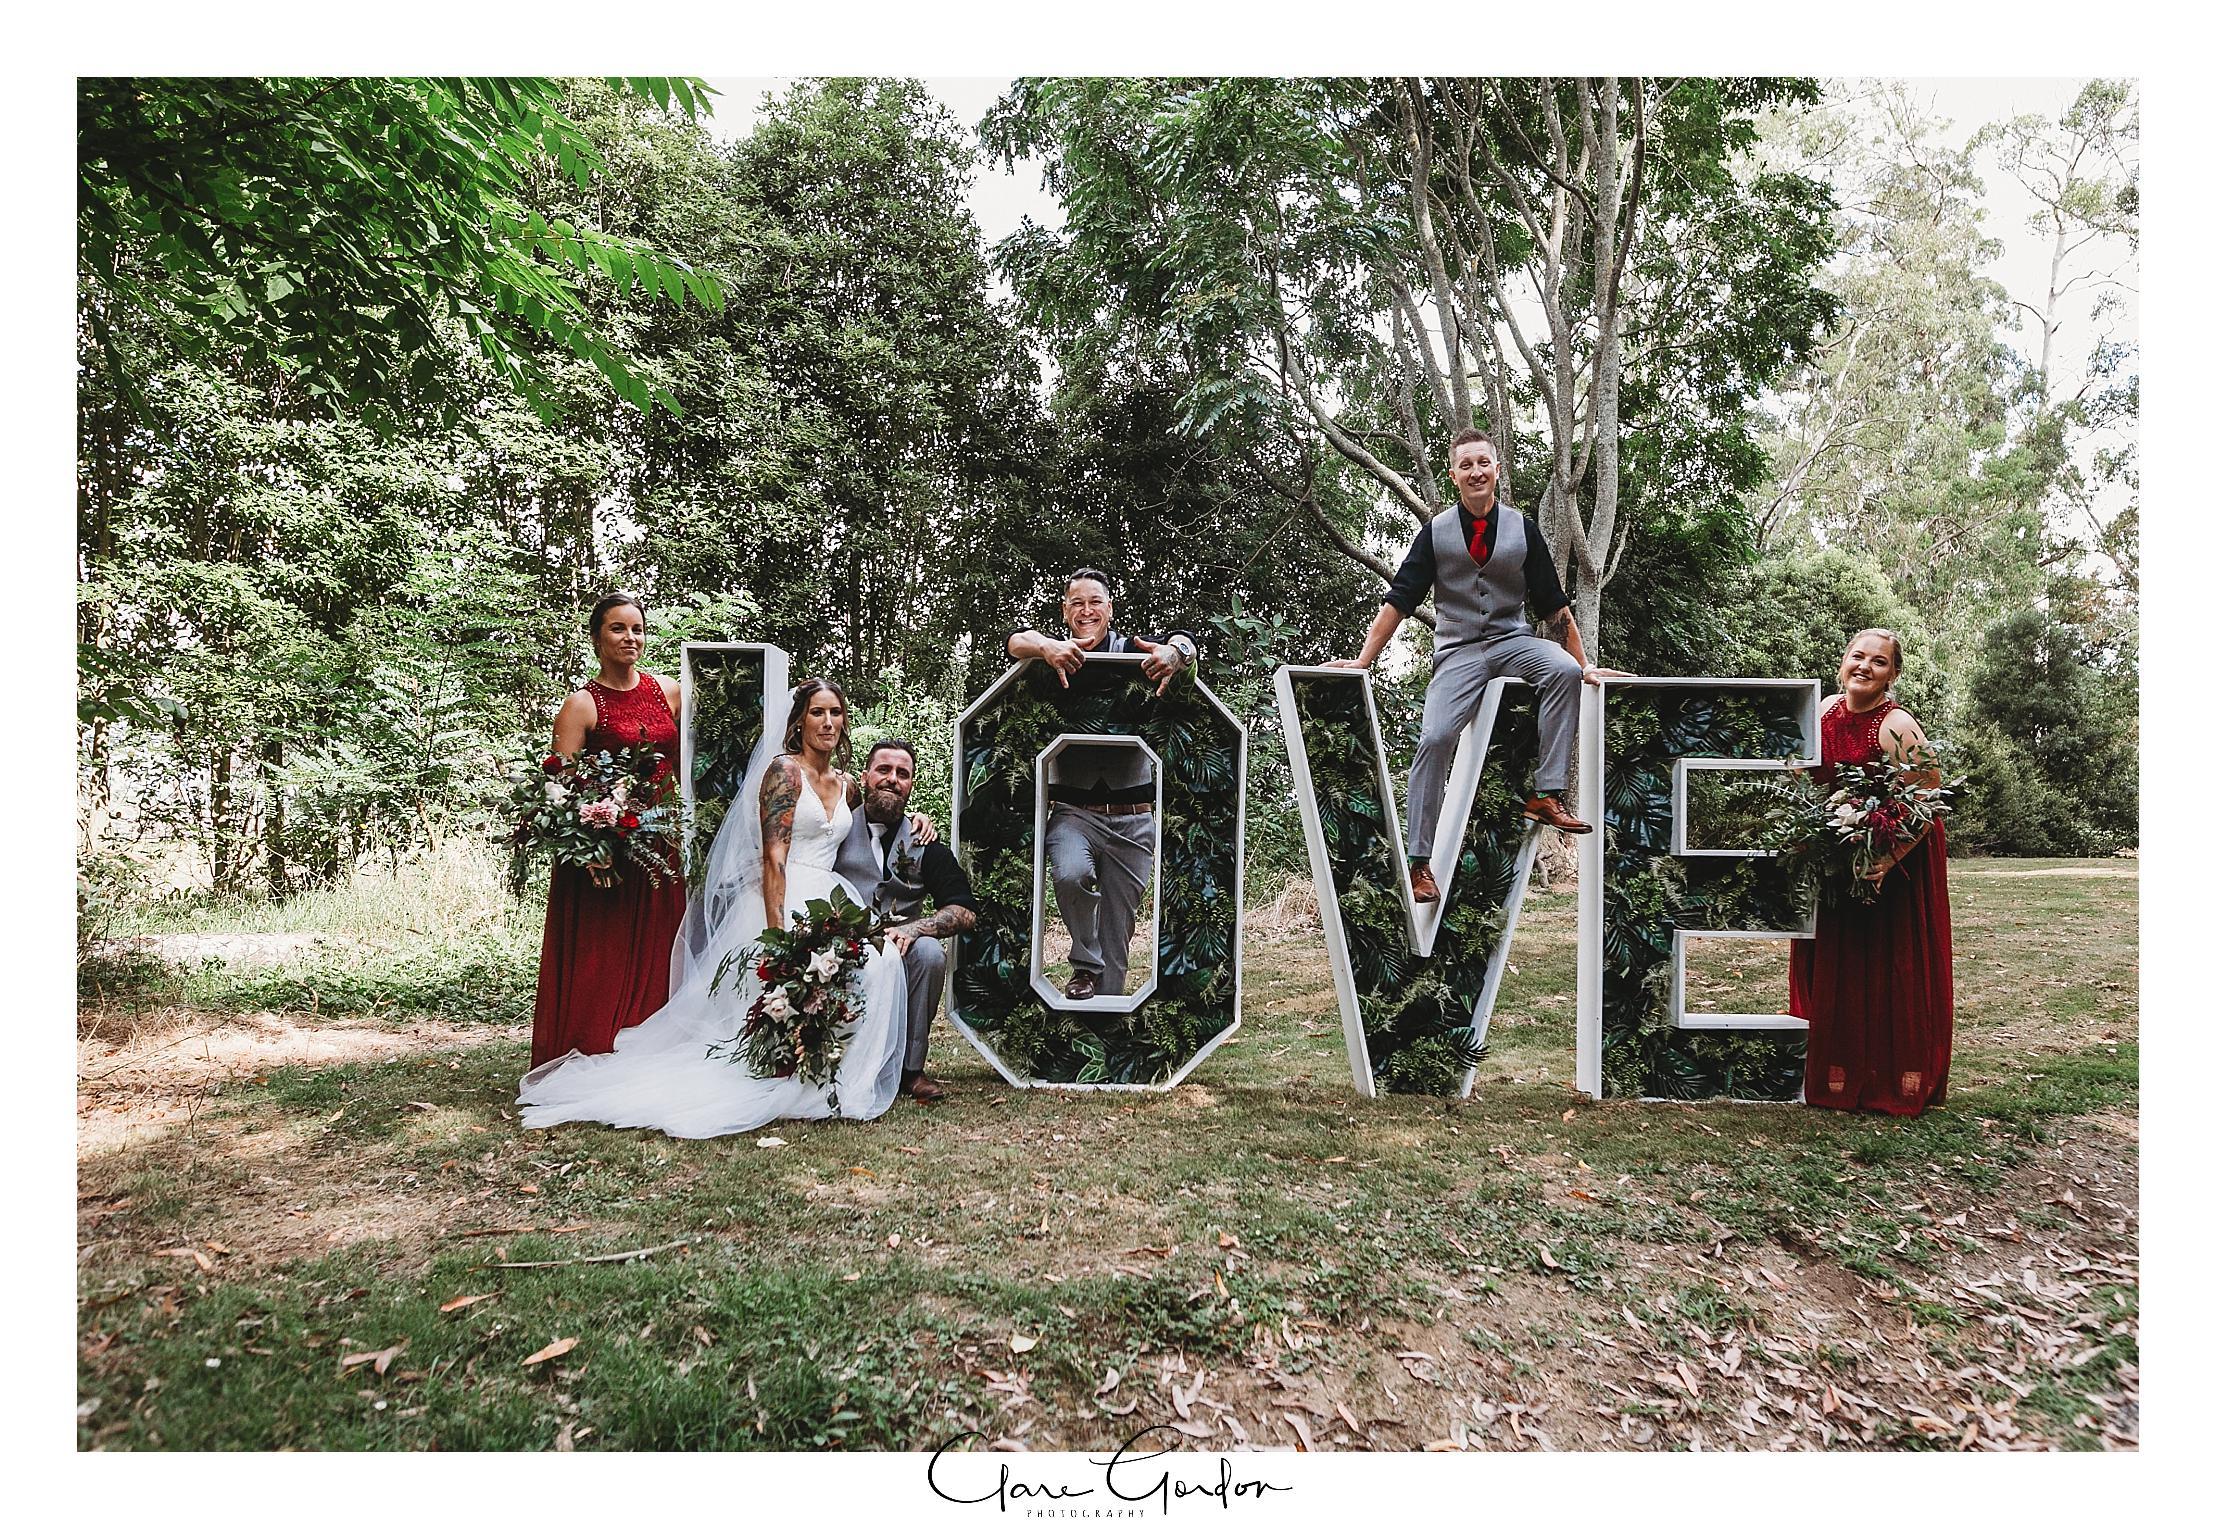 Waikato-wedding-photographer-Forest-weddnig-Hamilton-wedding-Newzealand (82).jpg